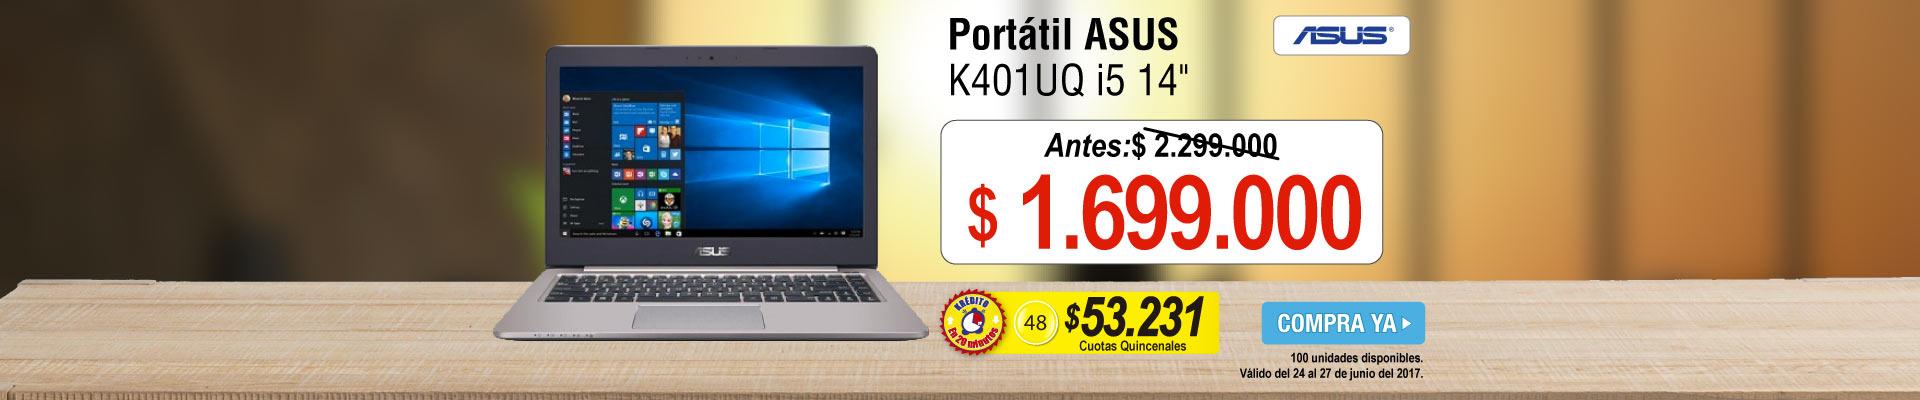 Portátil ASUS K401UQ i5 14 Plata - banner principal